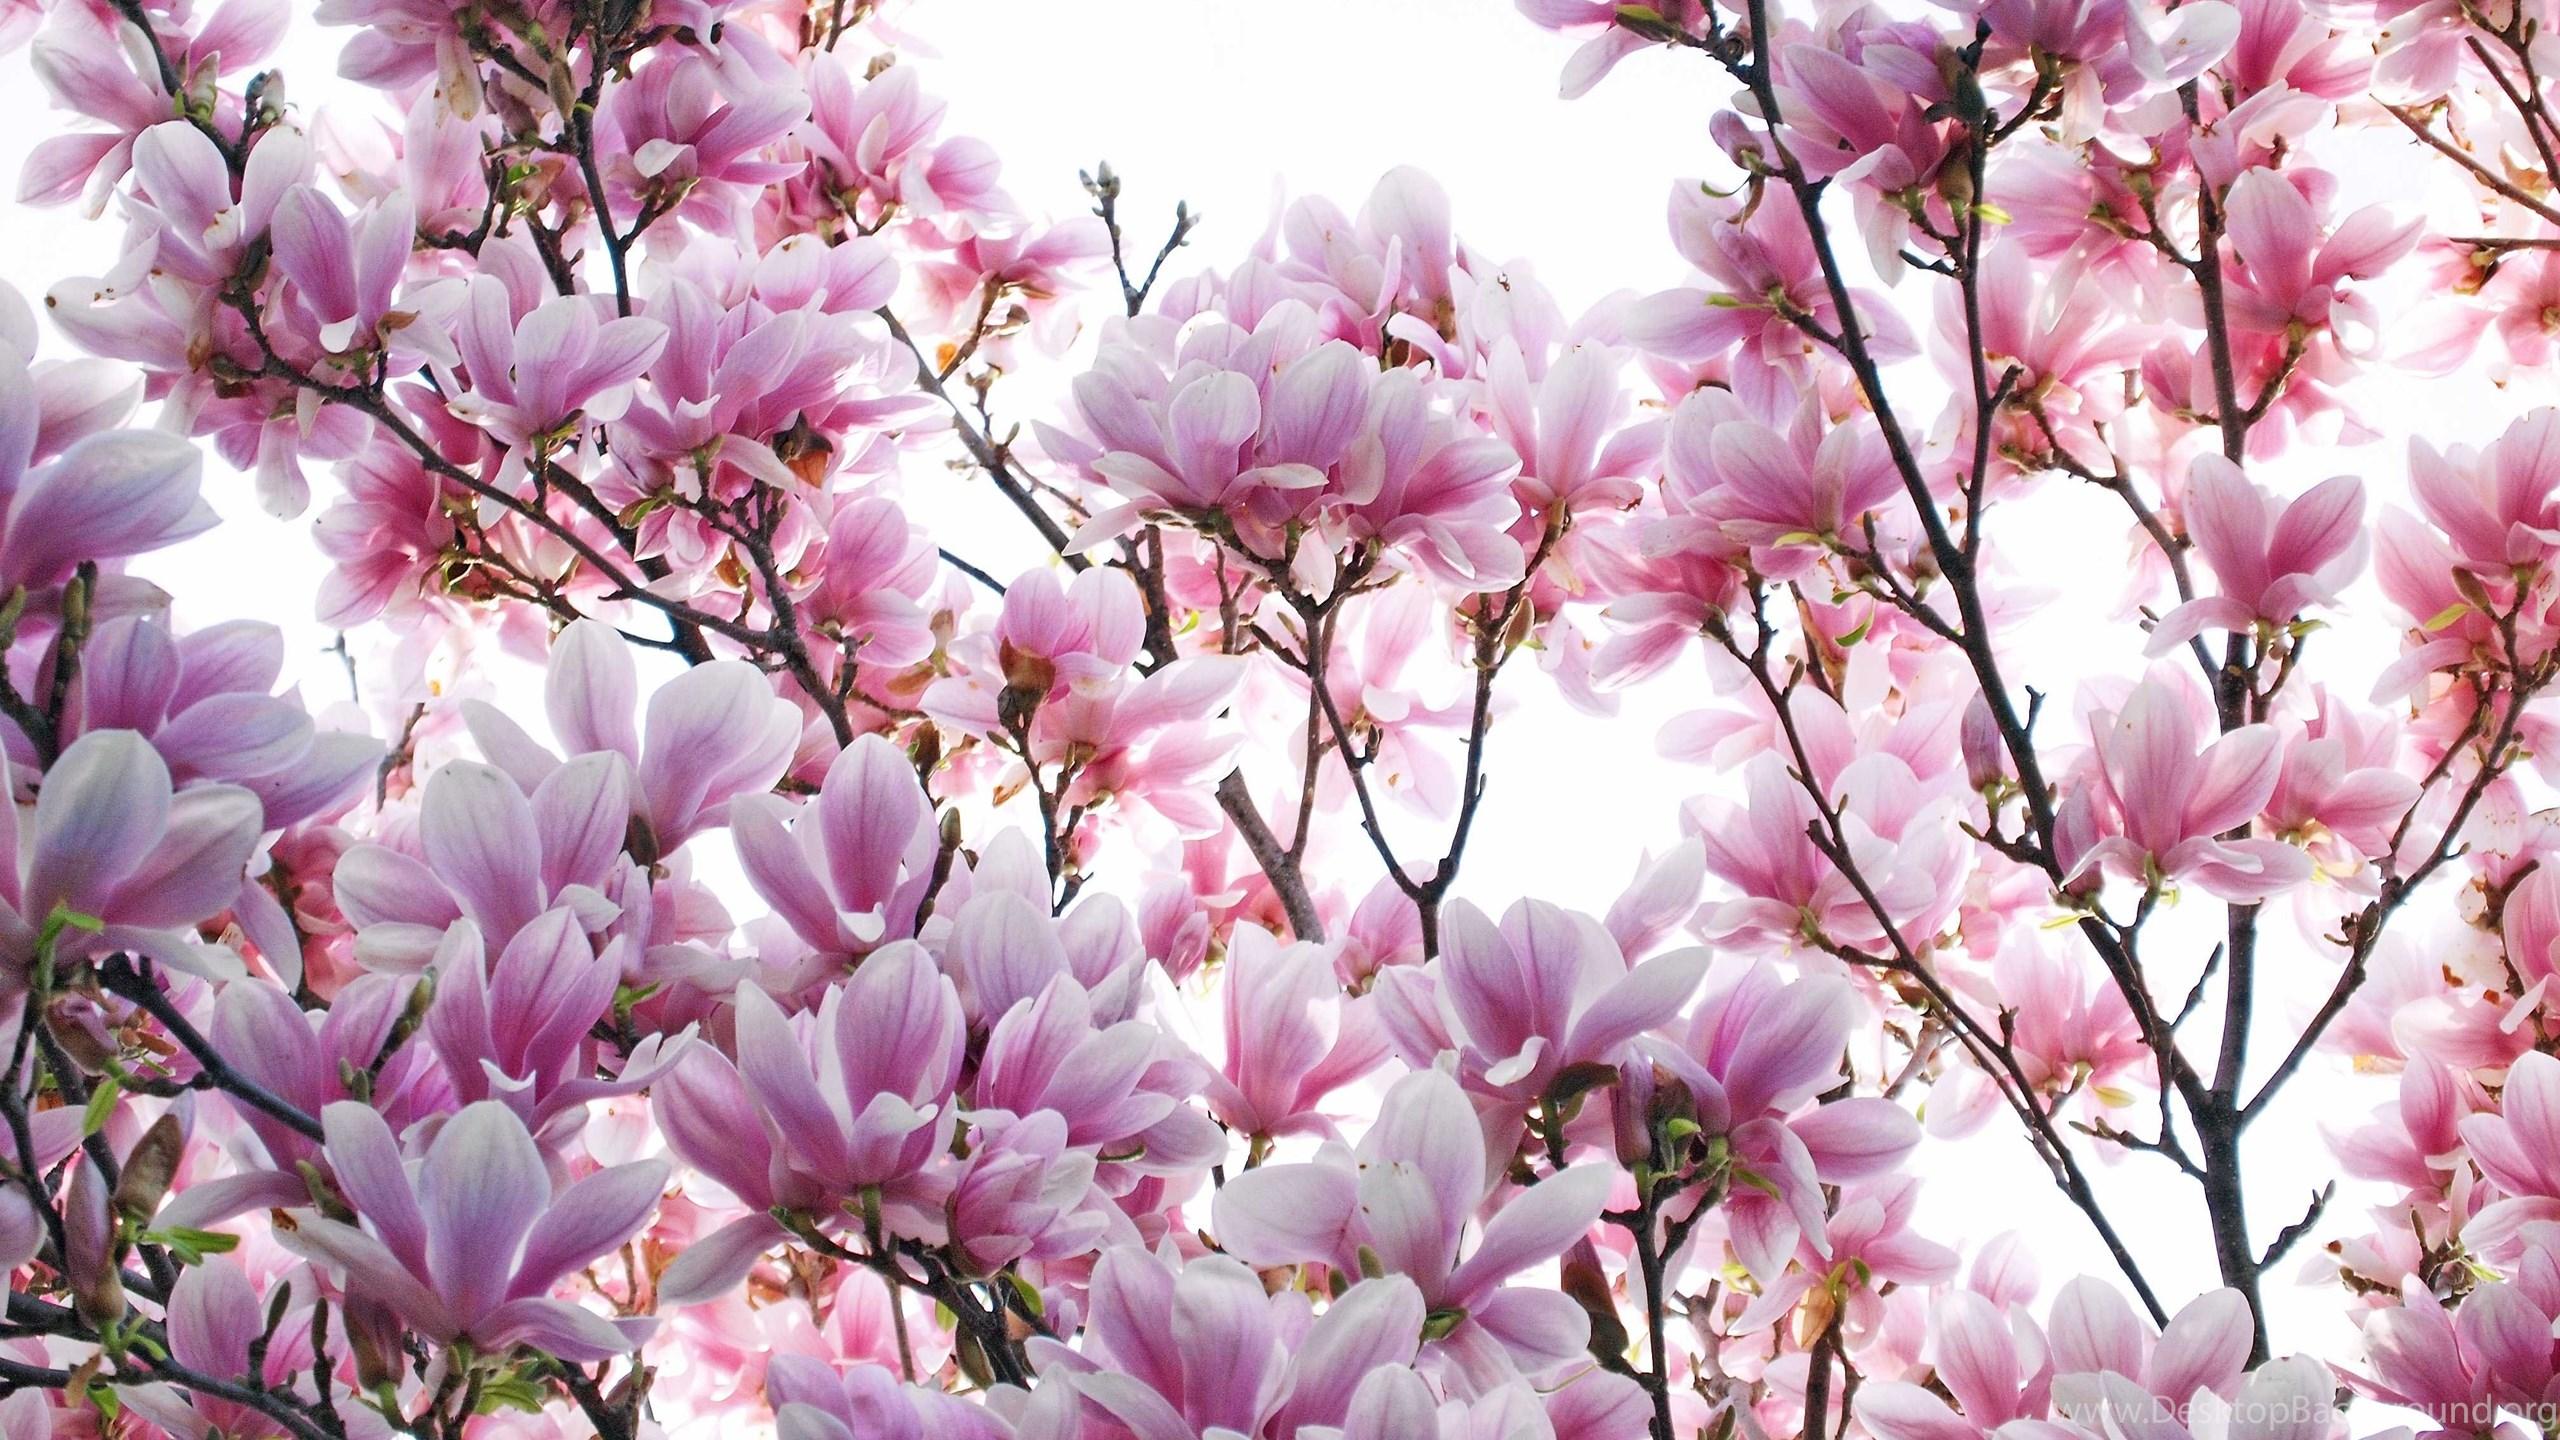 Magnolia flower wallpapers best collection free download desktop background - Magnolia background ...